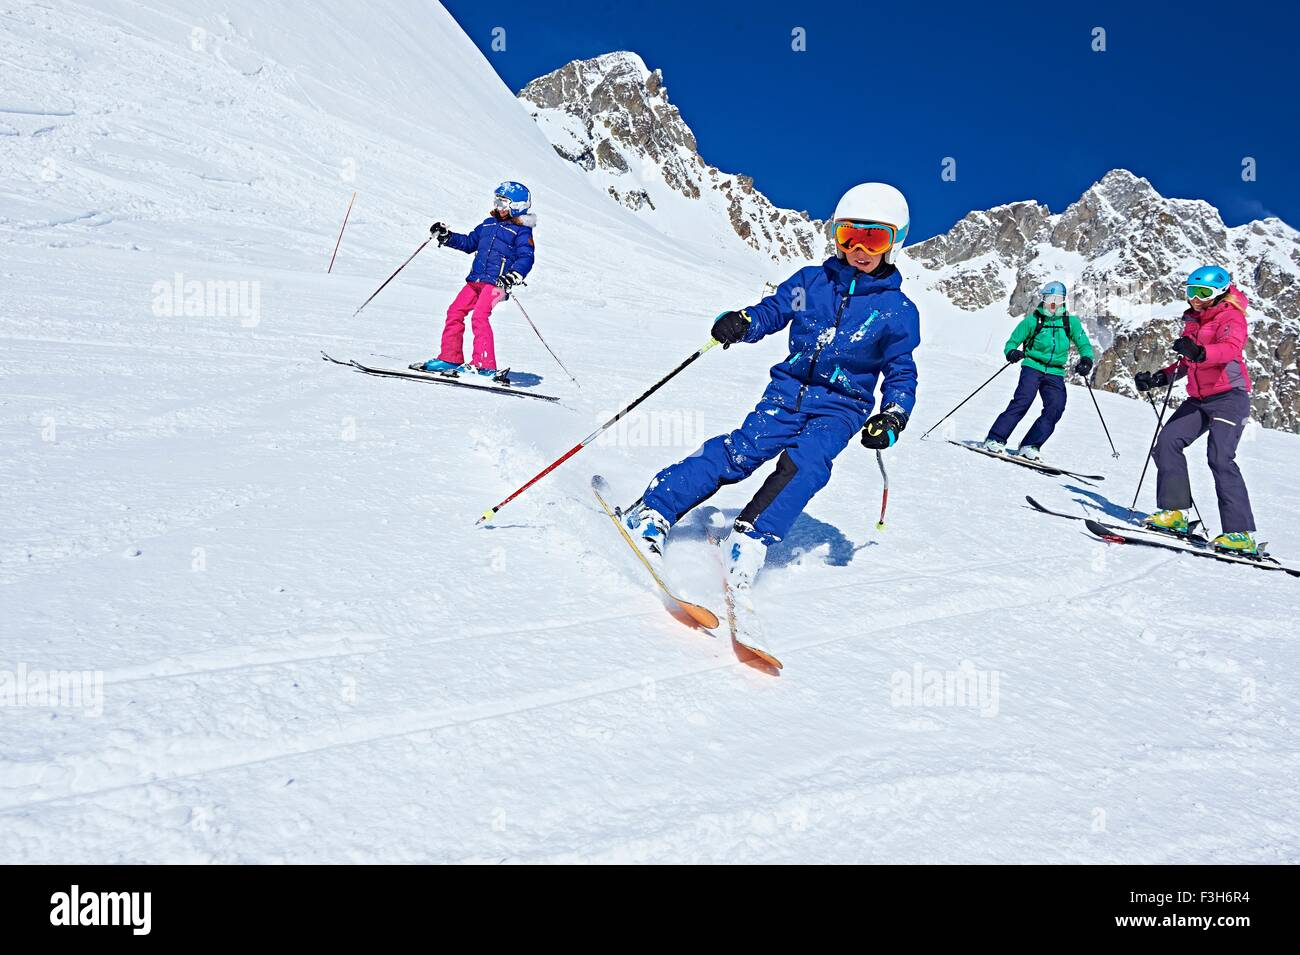 Famille le voyage de ski, Chamonix, France Photo Stock